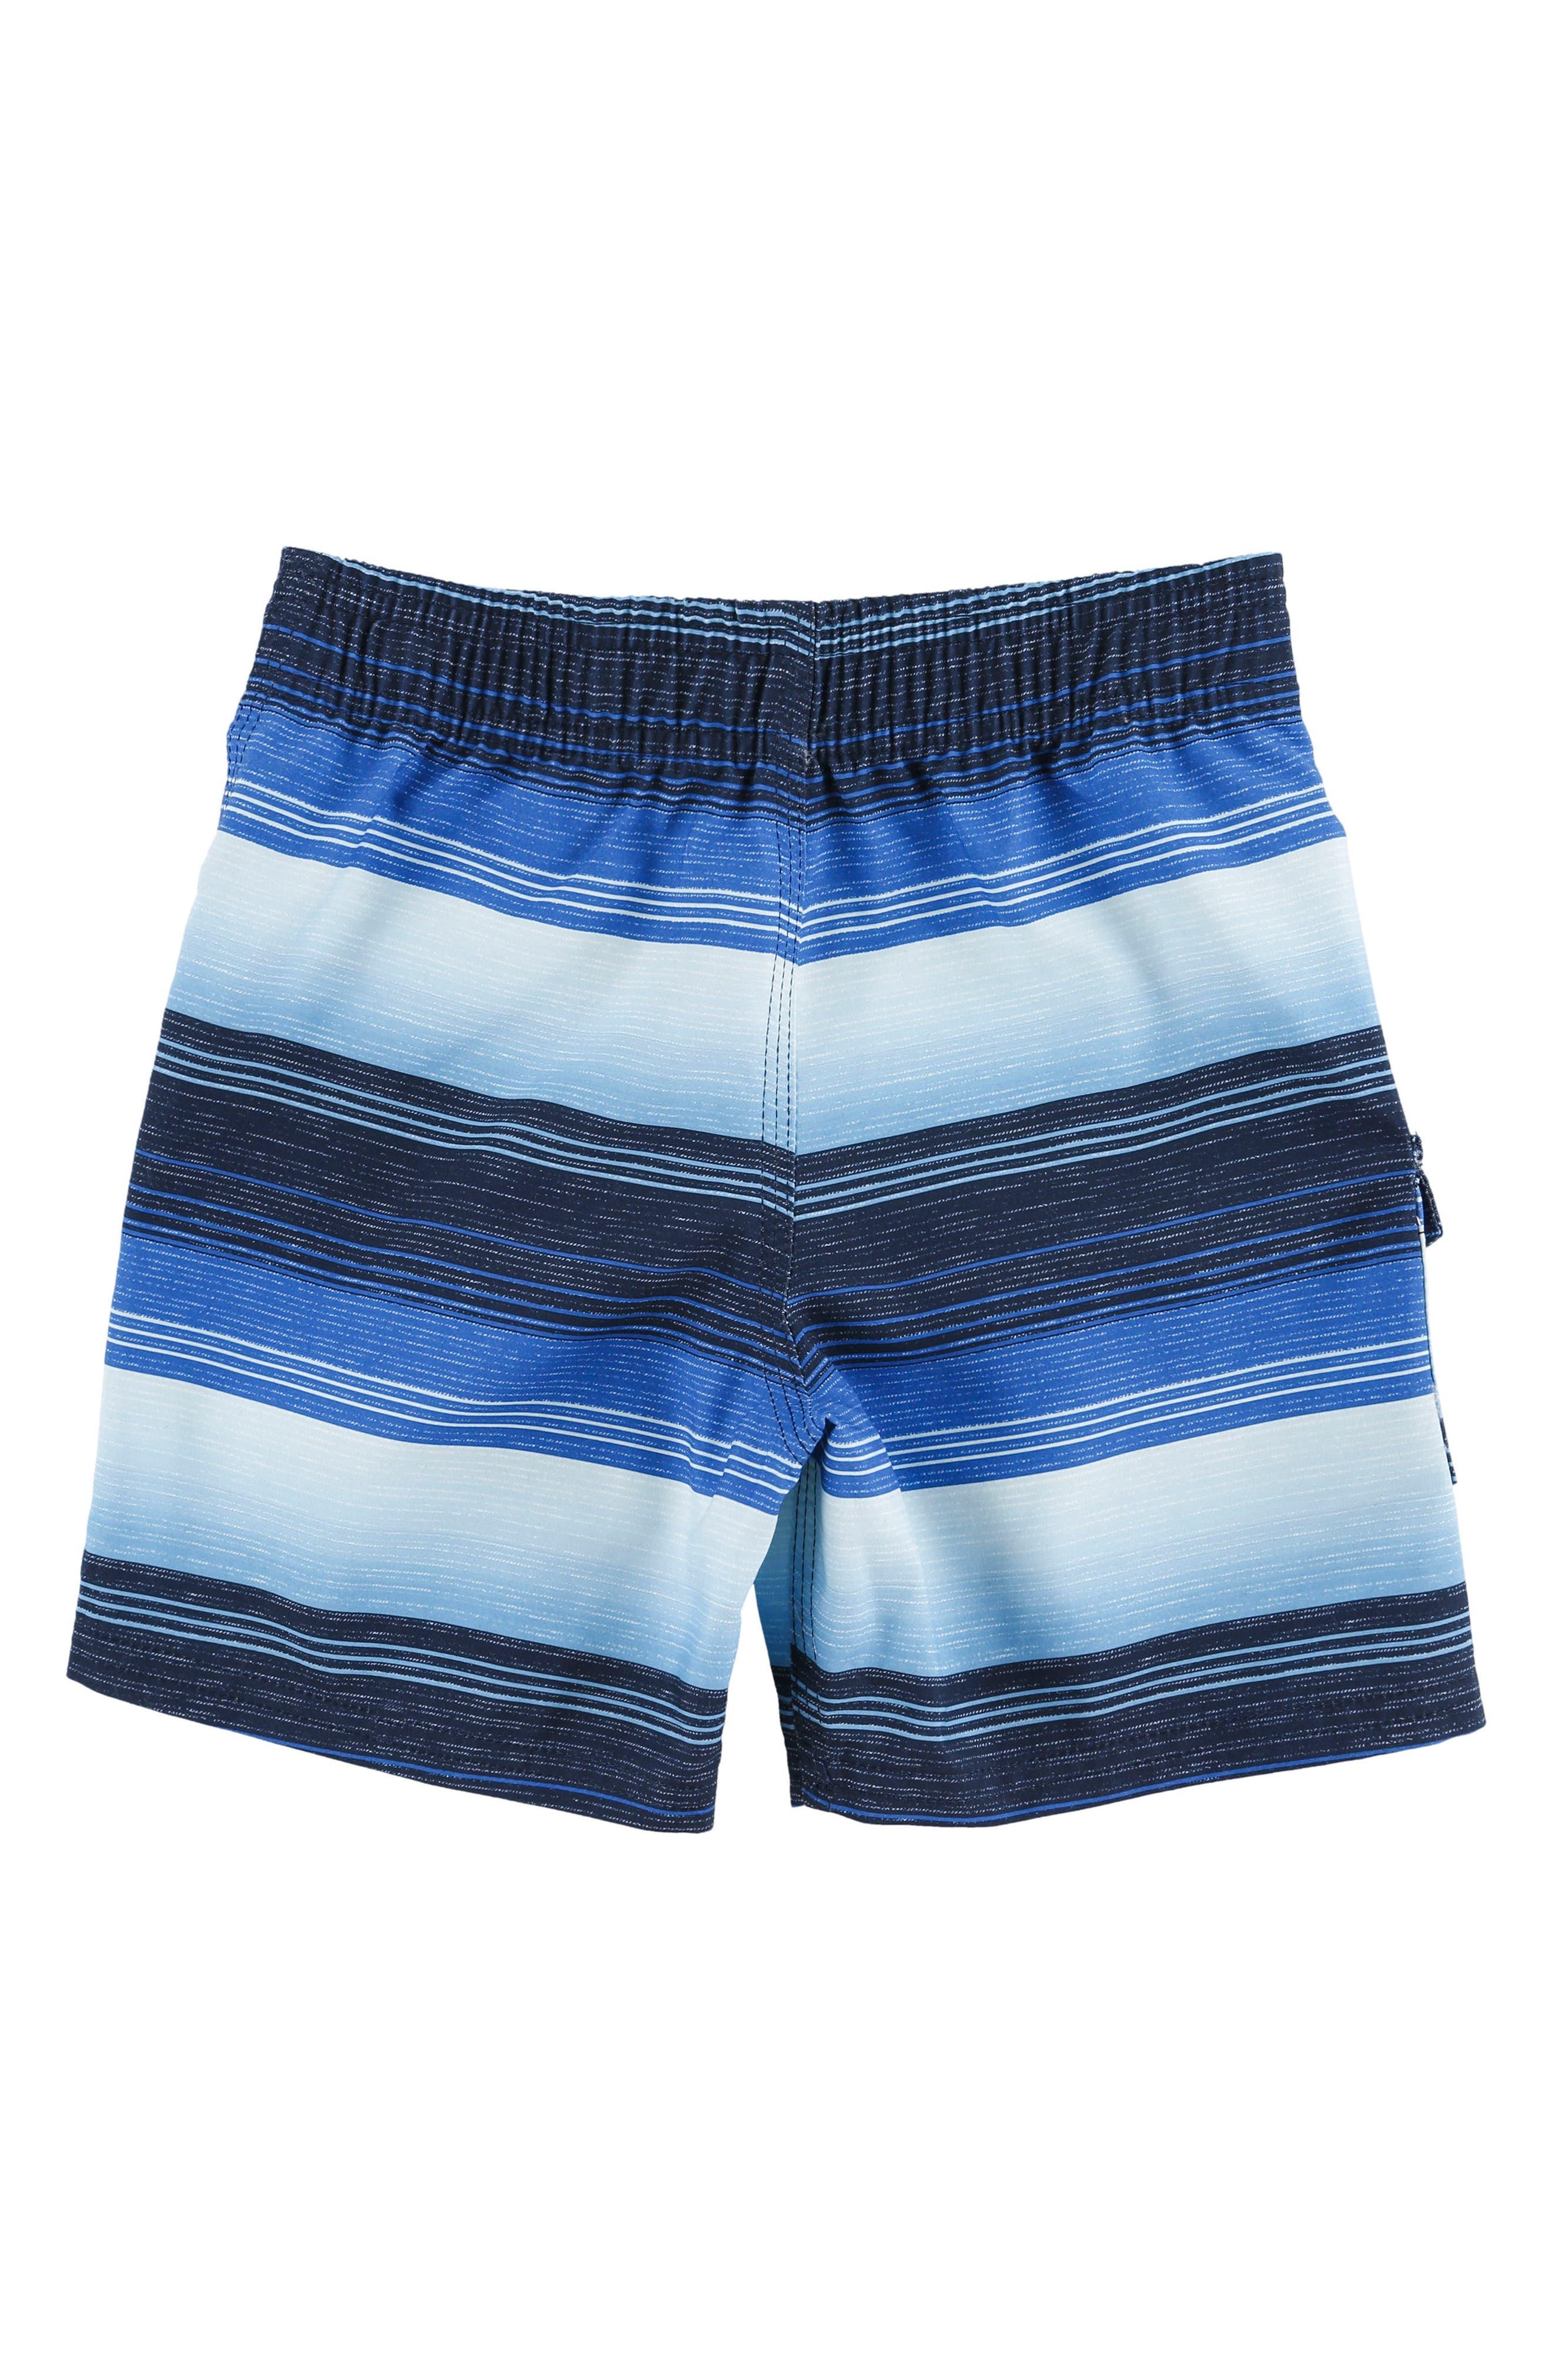 Alternate Image 2  - O'Neill Santa Cruz Stripe Board Shorts (Toddler Boys)